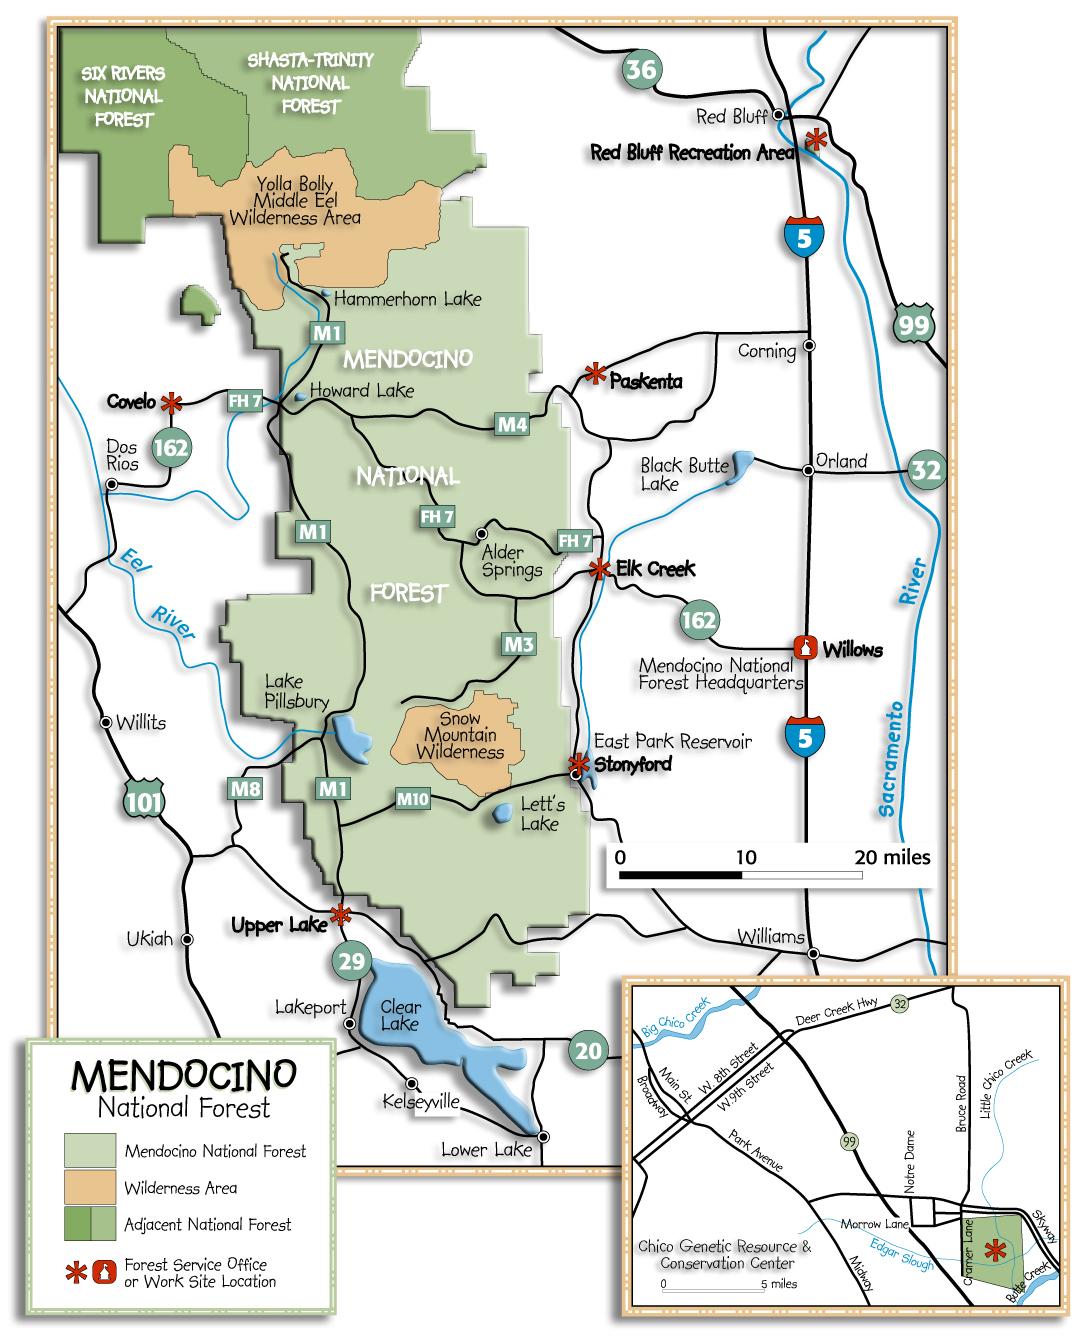 Red Bluff California Mapphoto Gallery Ofstelprdb Labeled Map Wit - Red Bluff California Map